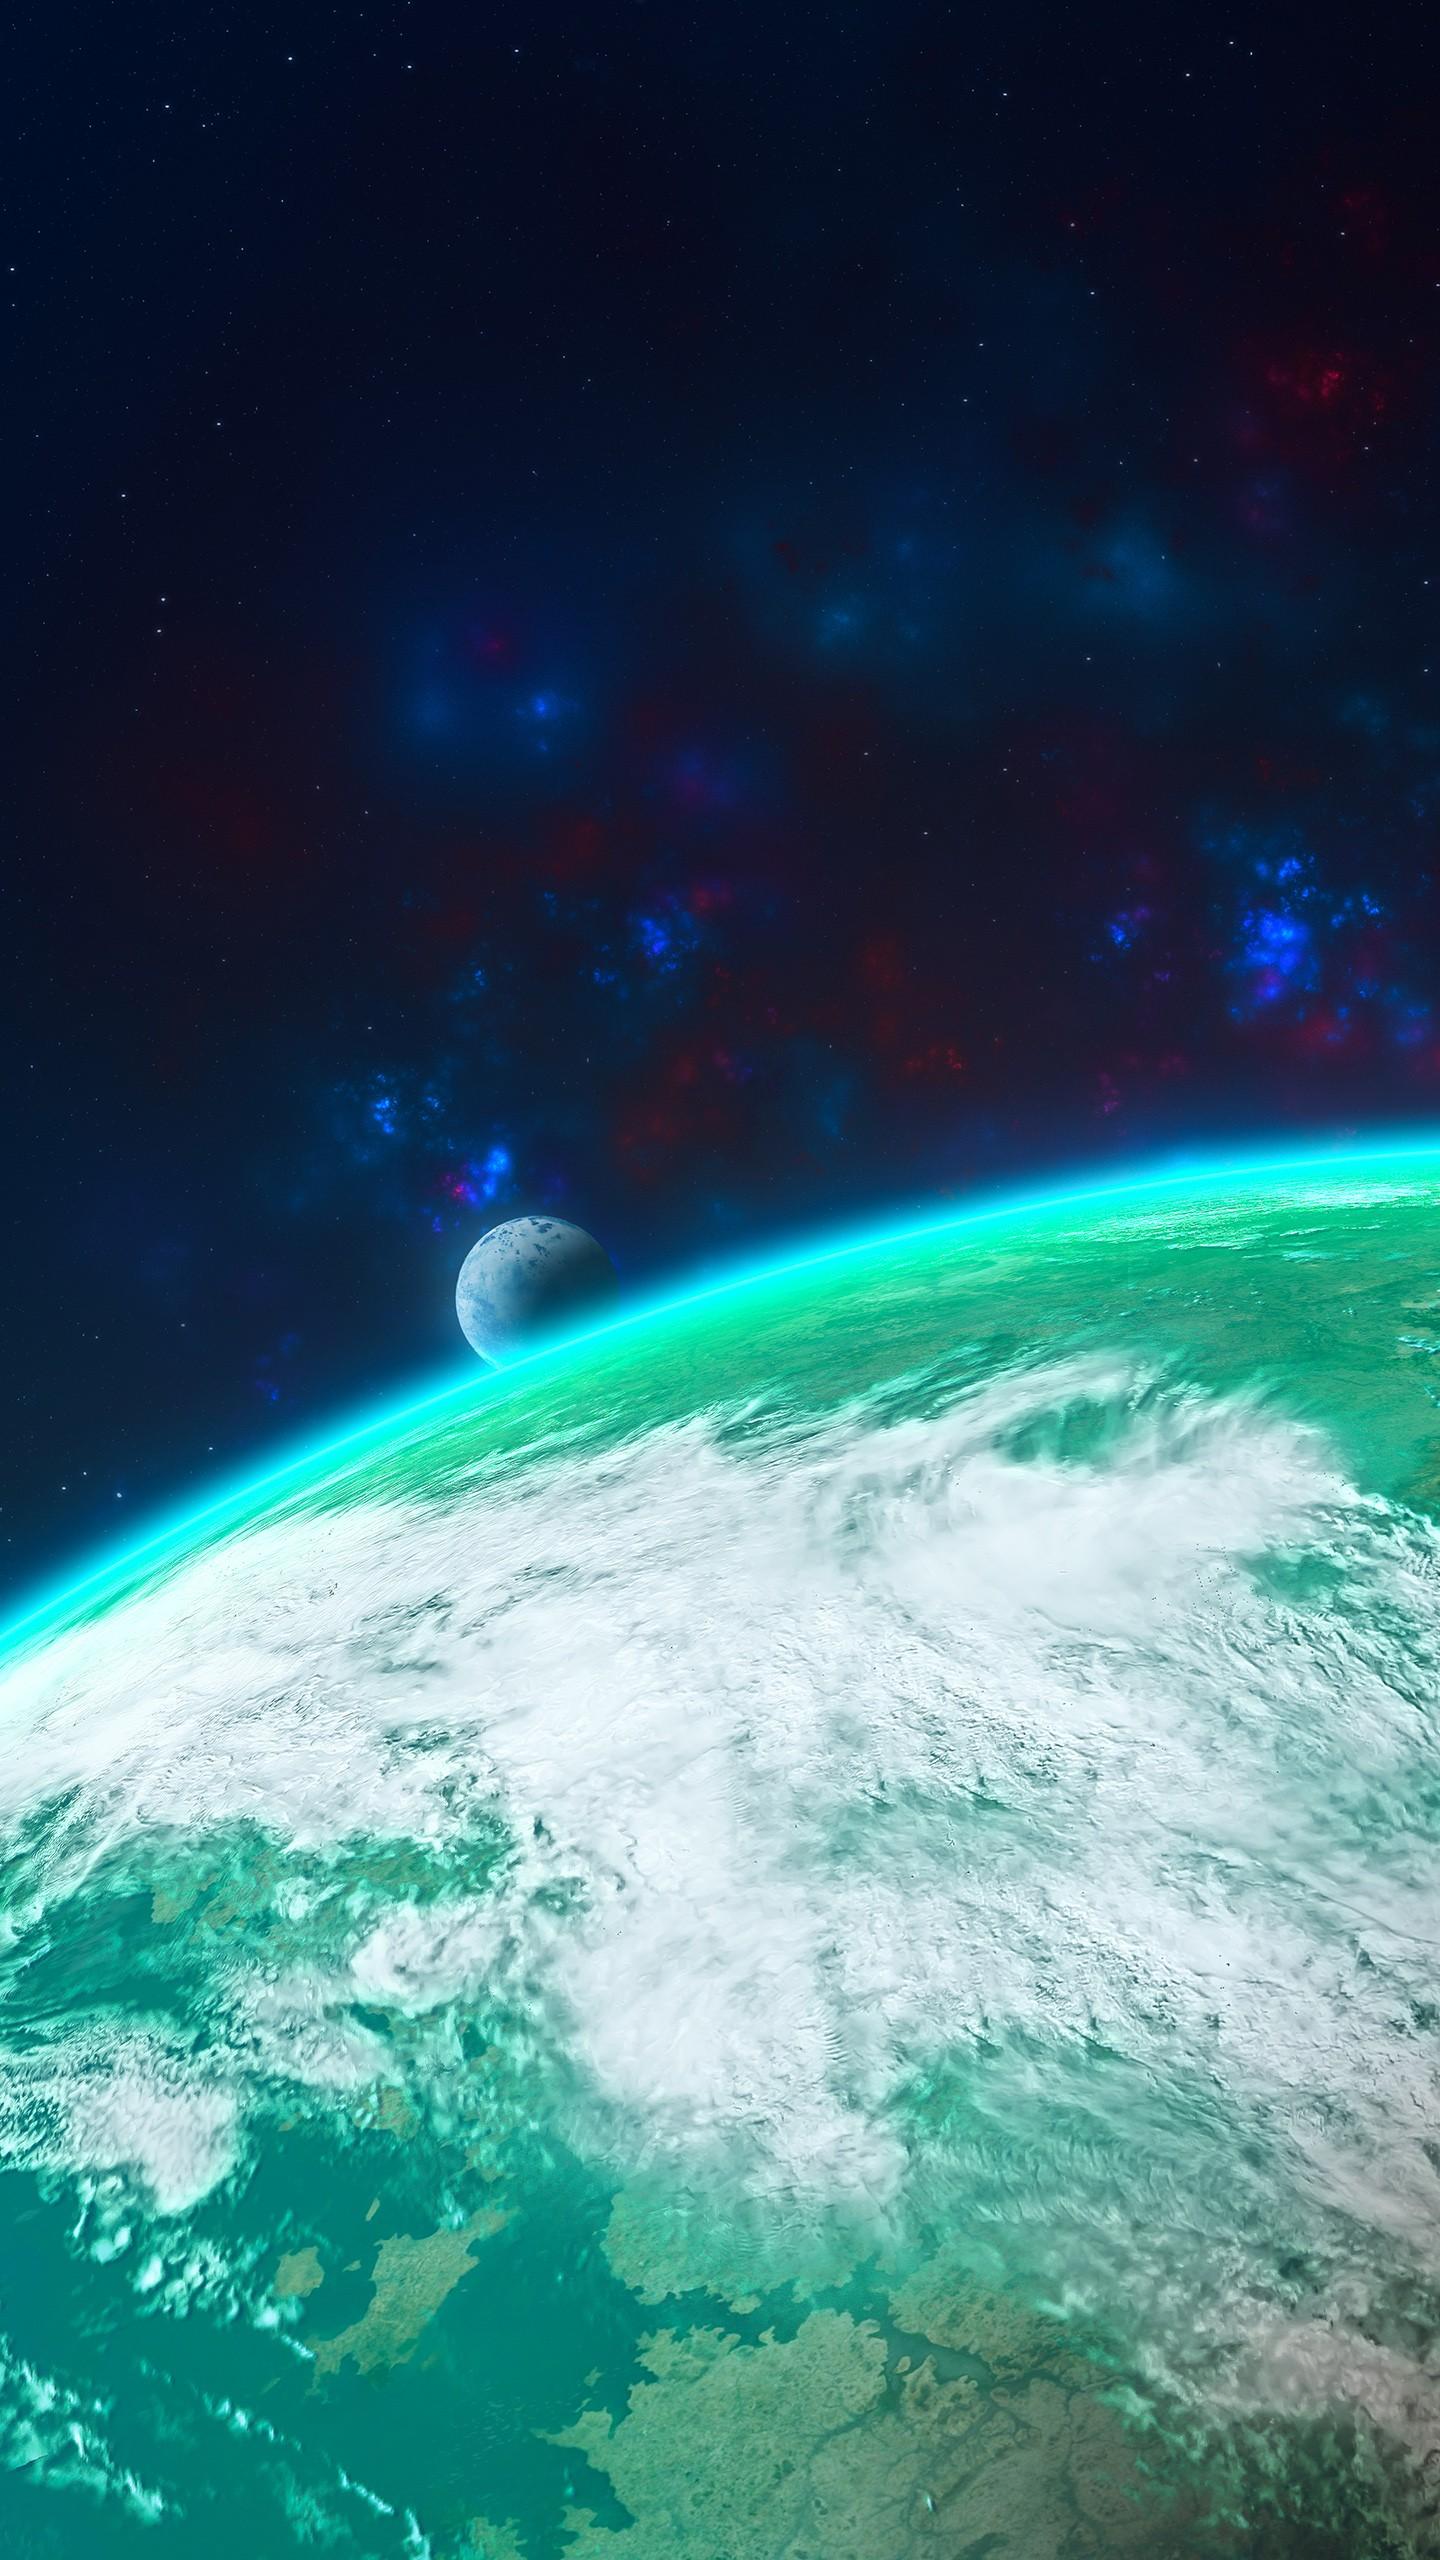 Earth 3d Wallpaper Windows Planets 4k 8k Wallpapers Hd Wallpapers Id 27200